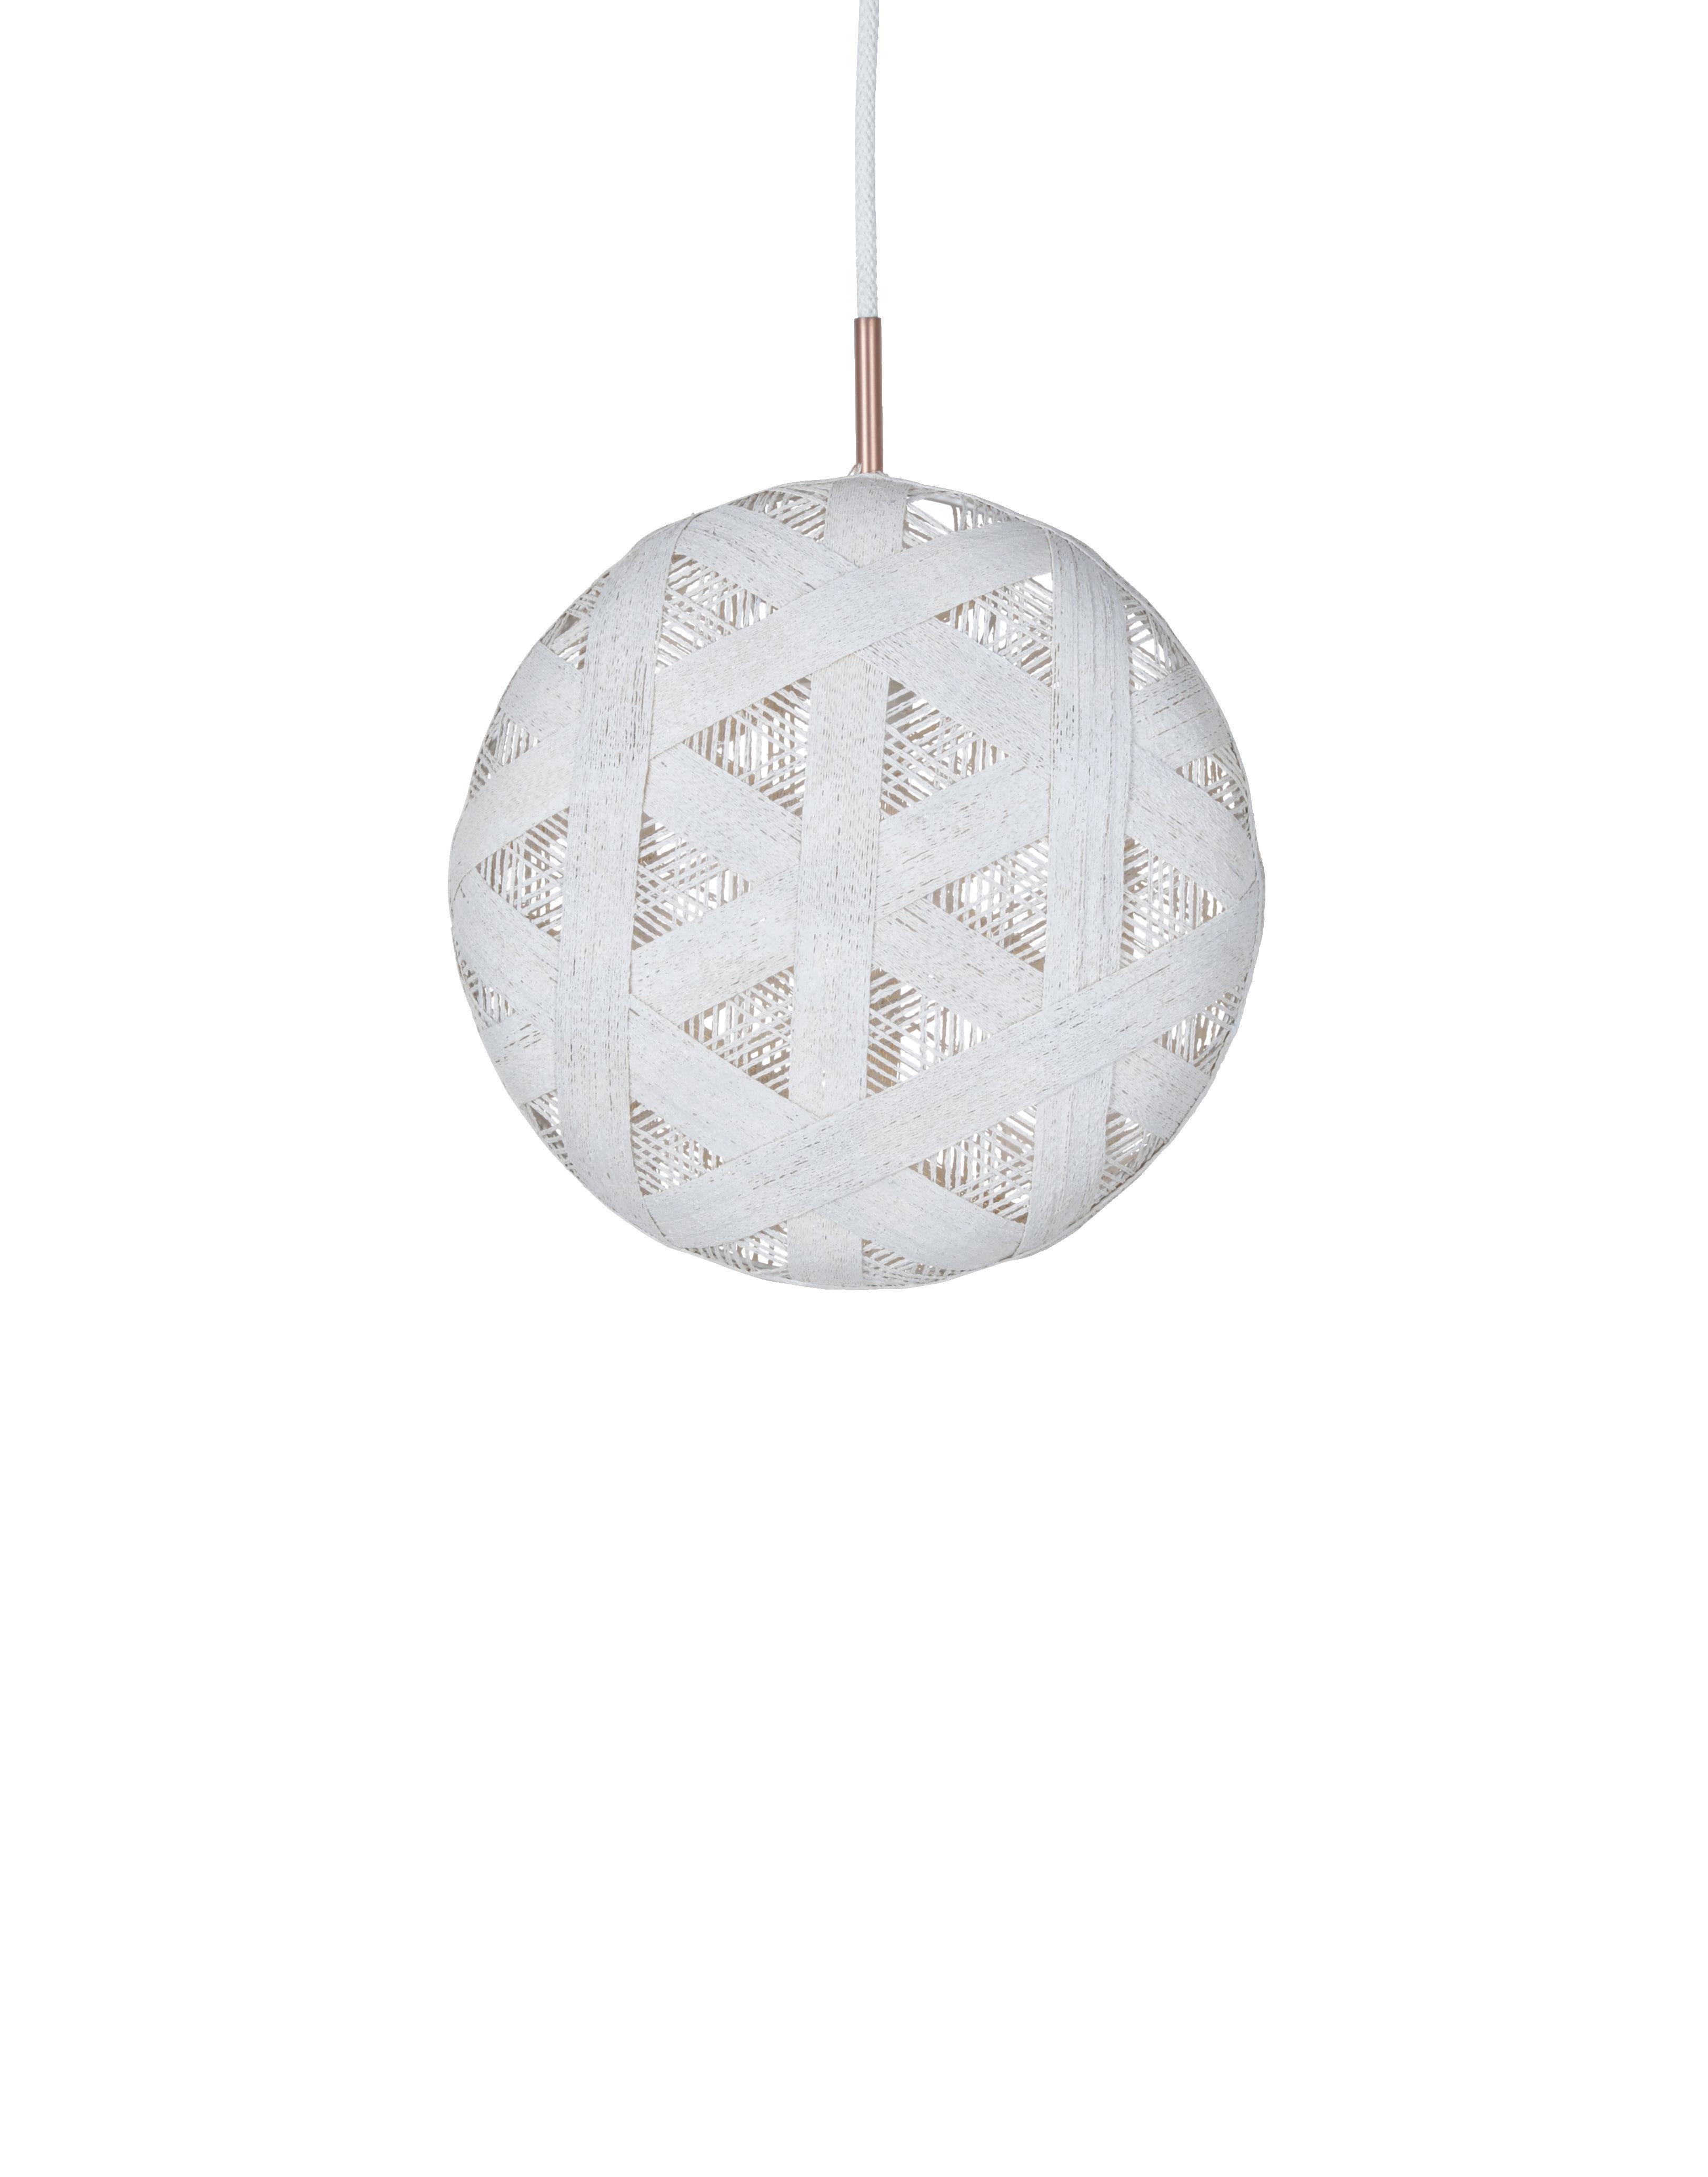 Lighting - Pendant Lighting - Chanpen Hexagon Pendant - Ø  26 cm by Forestier - White / Triangle patterns - Woven acaba